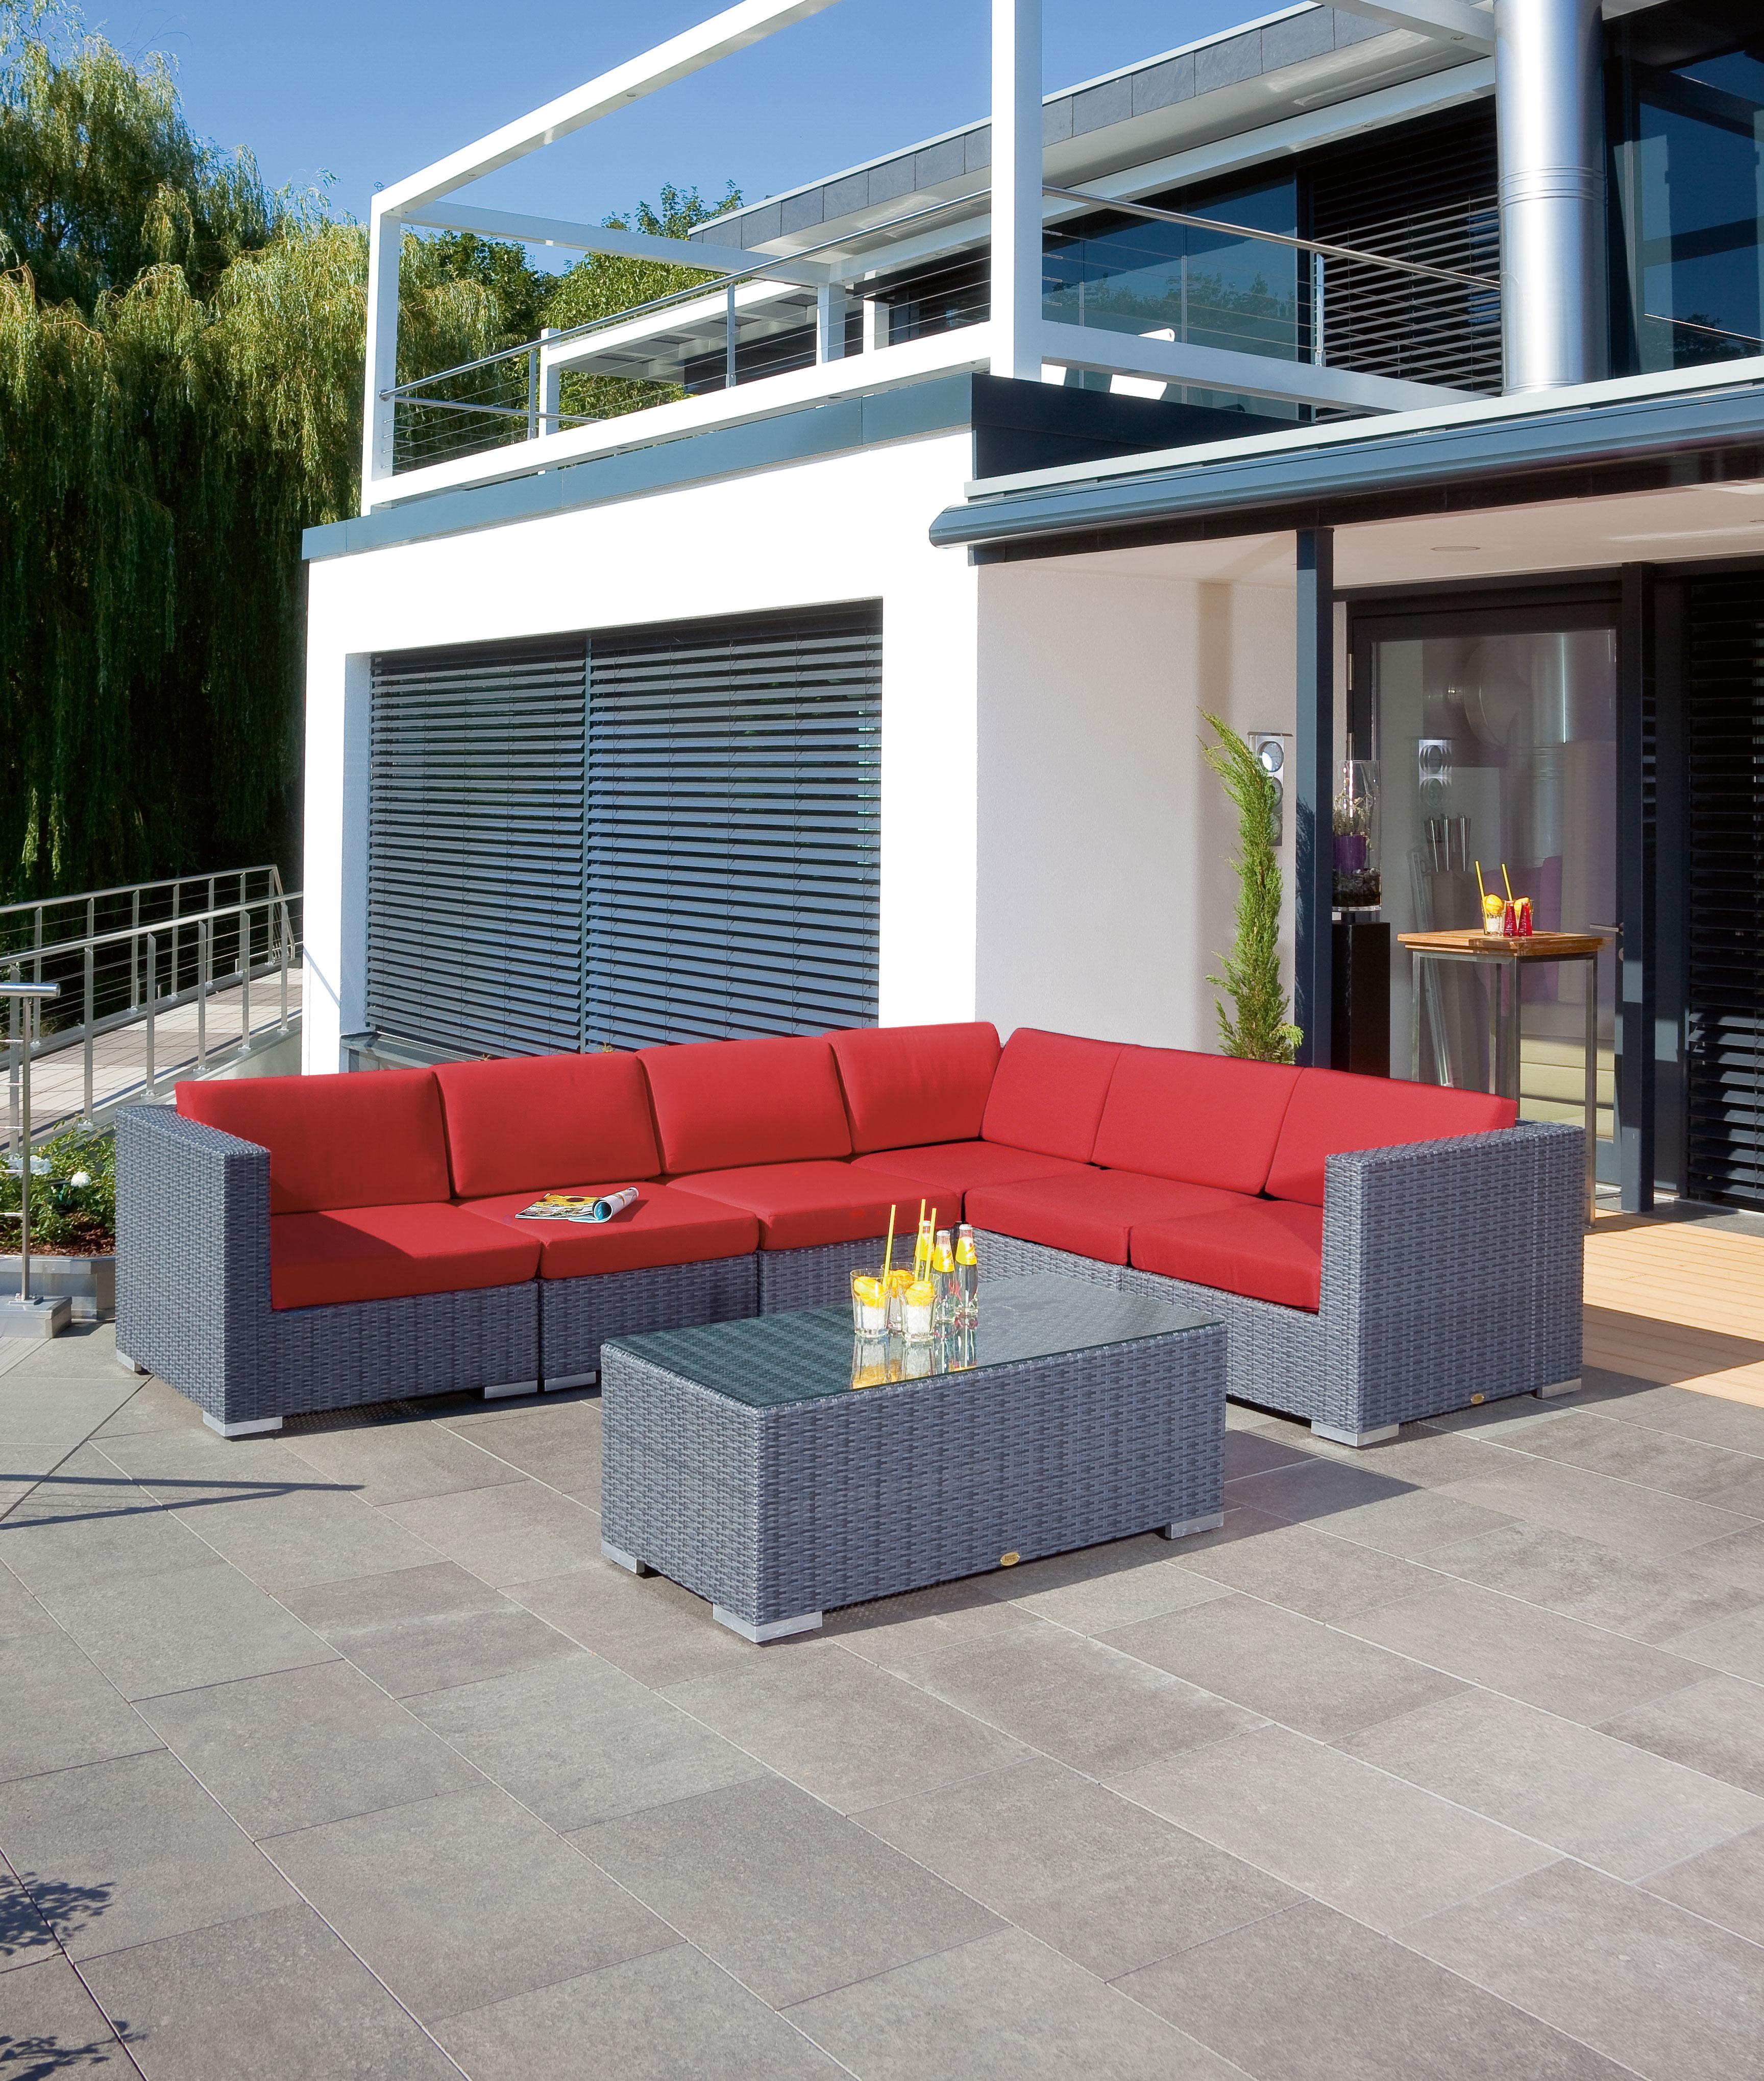 Gartenbank / 3-Sitzer Sofa Korbmöbel Residence graphit-schwarz Bild 2